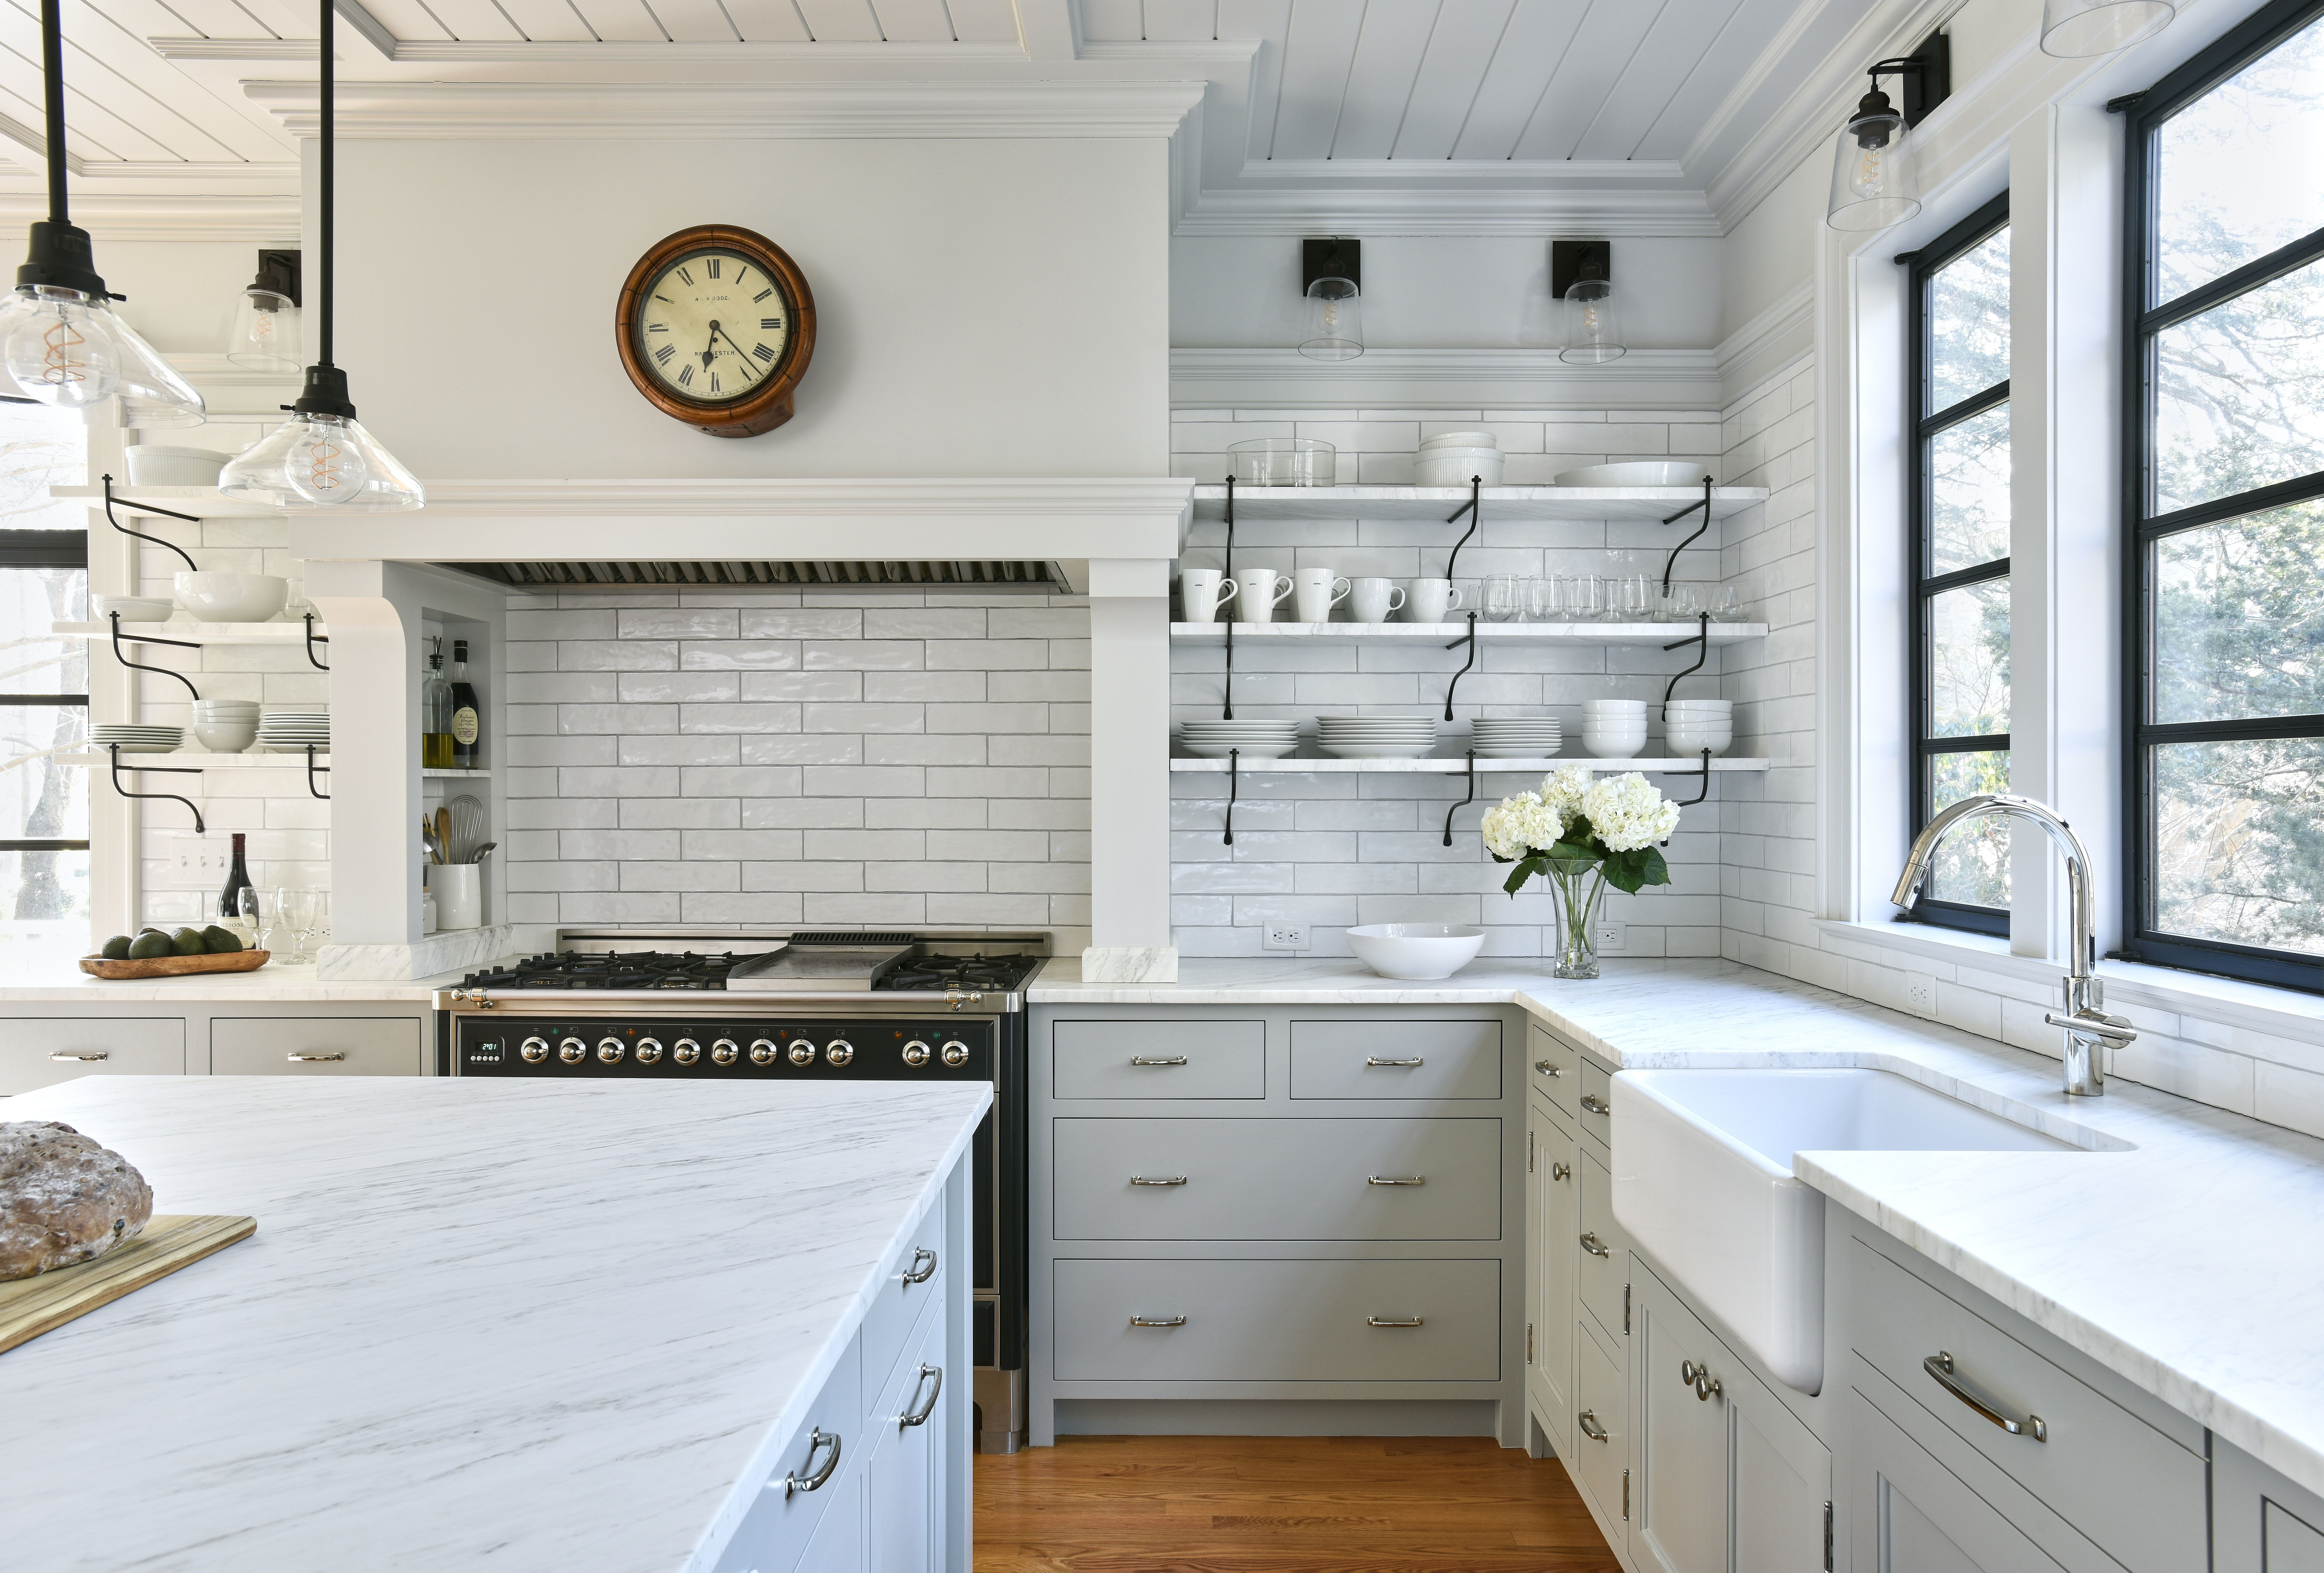 Modern English Kitchen Extra Long Subway Tiles Unique Black Metal Shelf Supports Custom Kitchen Remodel Kitchen Remodel Kitchen Design